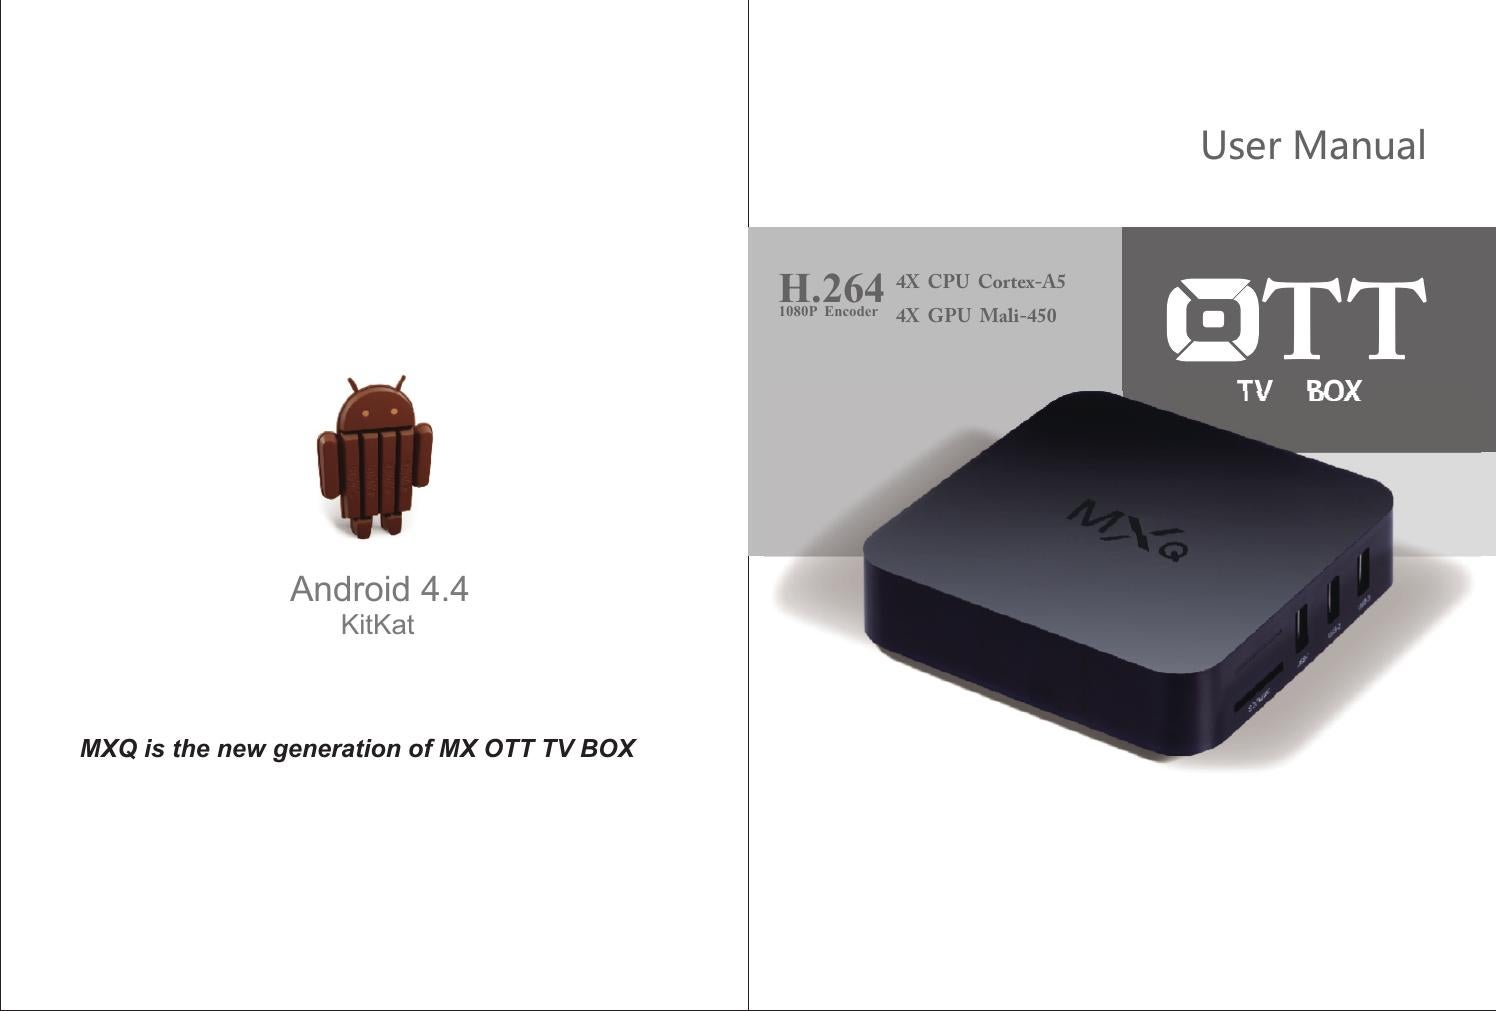 Mxq tv box user manual by century 21 casa de vis issuu.